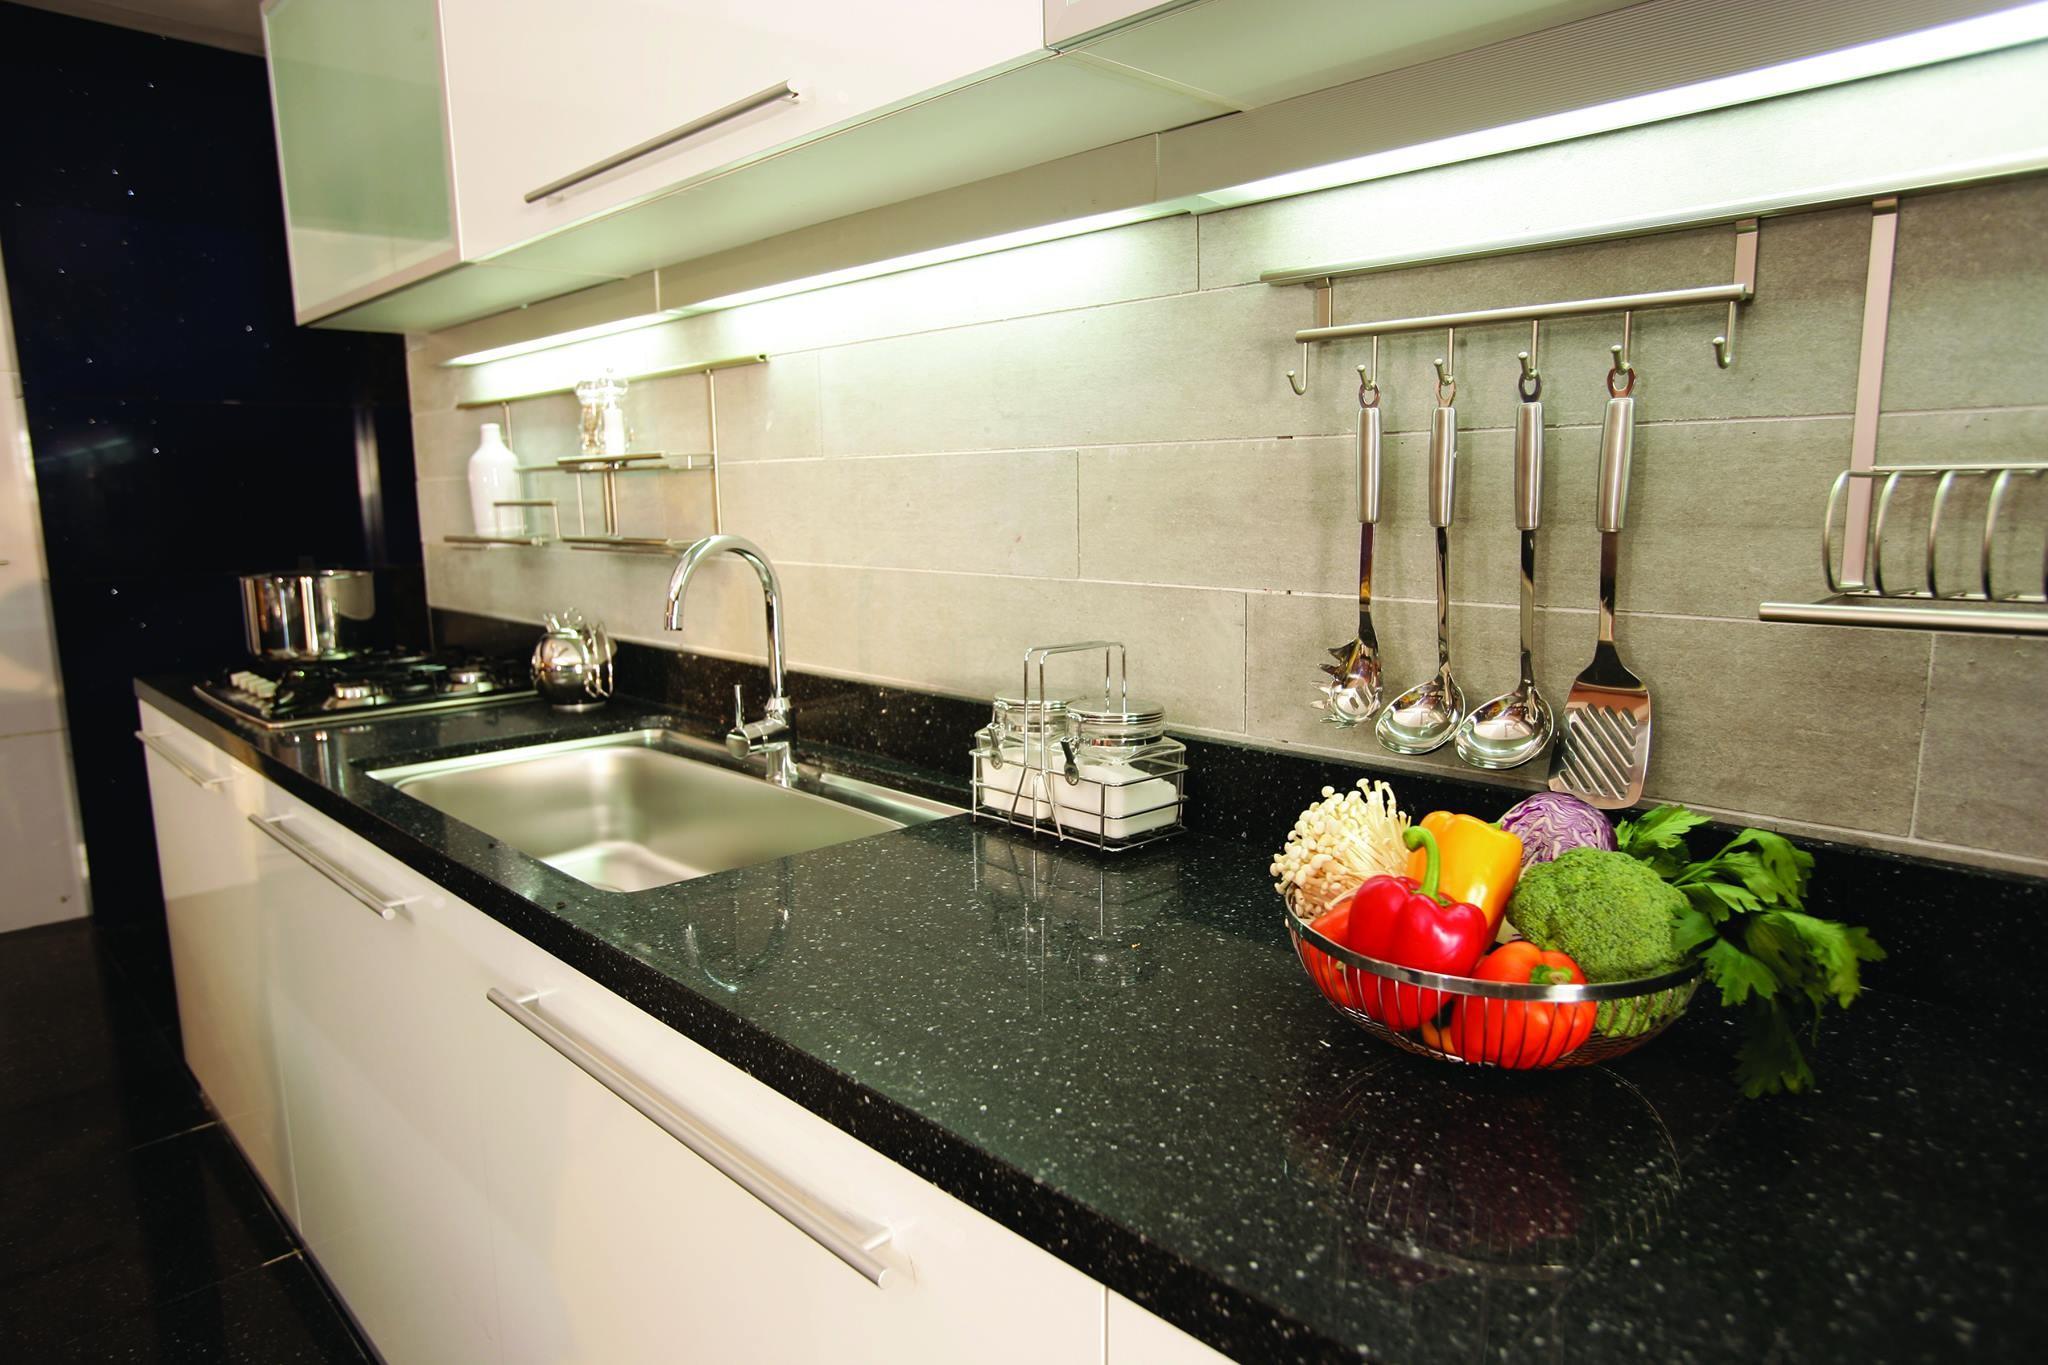 Koyu renkli modern bambu mutfak dolab modeli moda dekorasyonlar - Siyah Mutfak Tezgah Fiyatlar